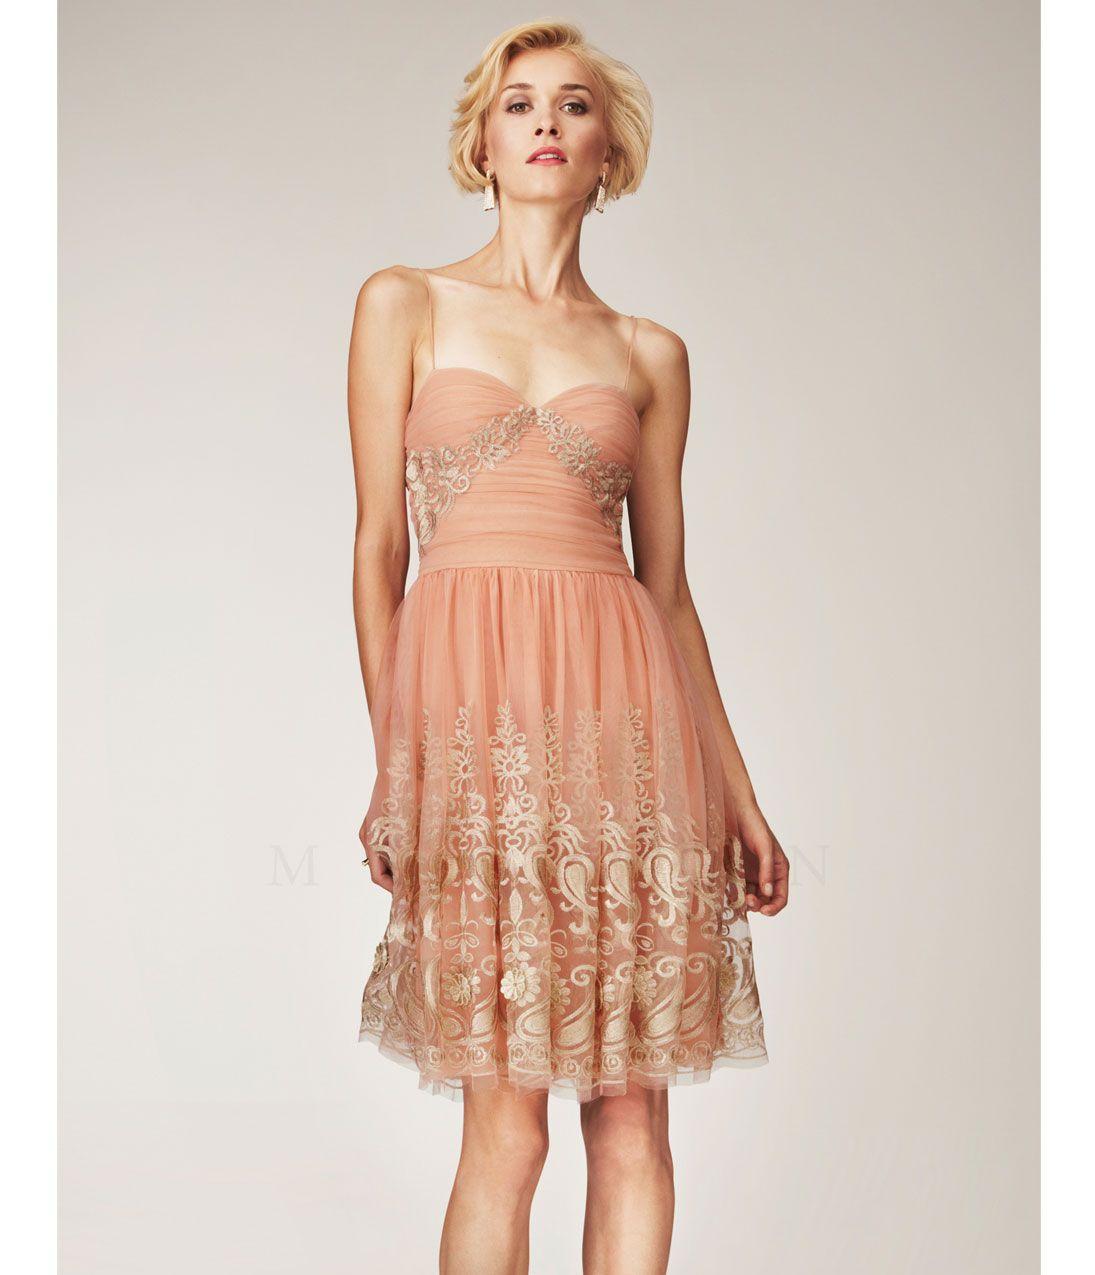 Salmon evening dress